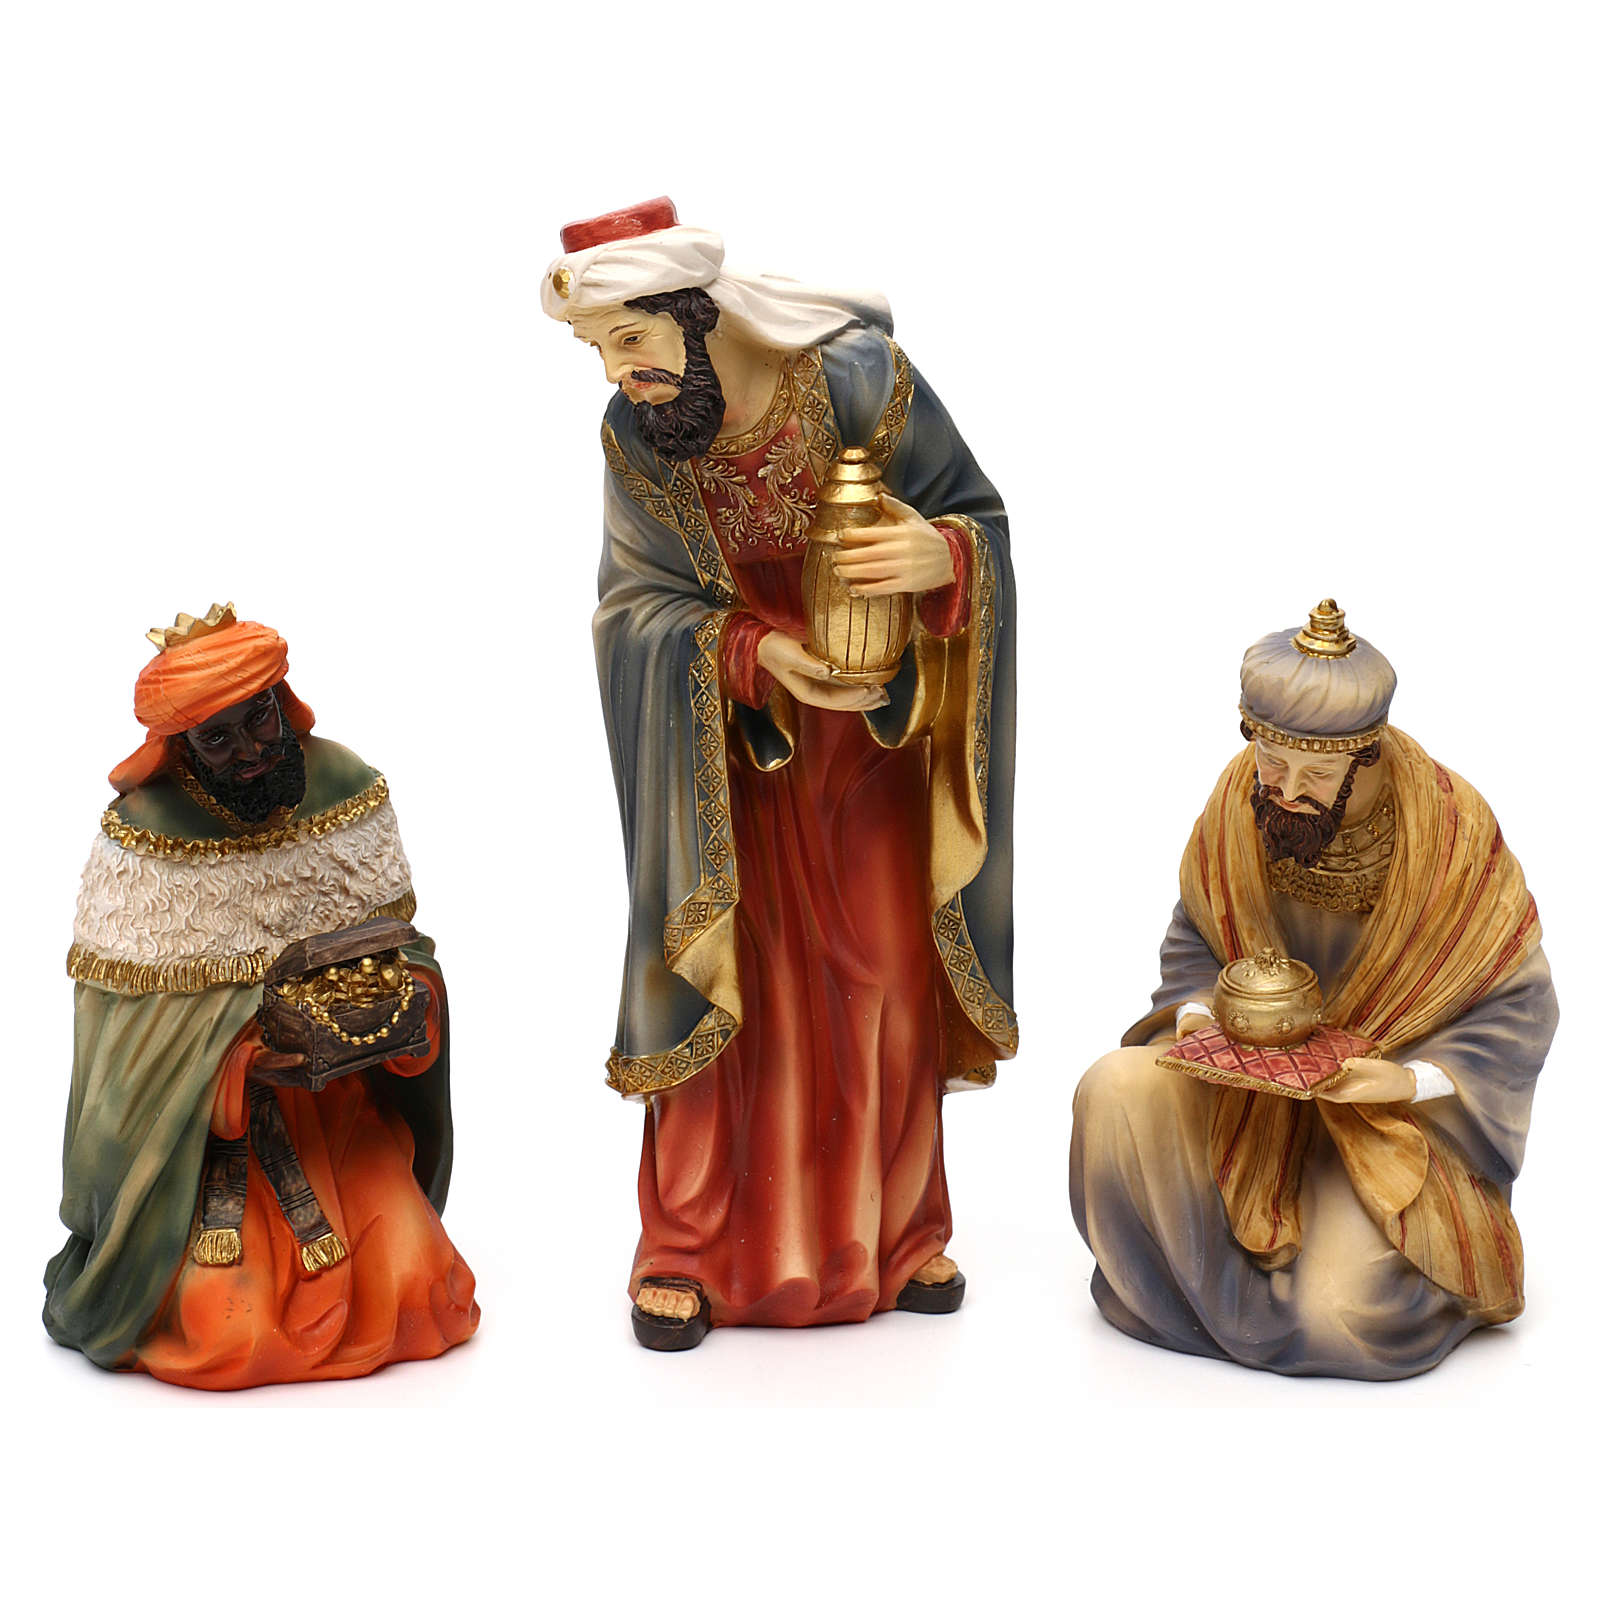 Nativity scene set in painted resin, Eastern style 24 cm 4